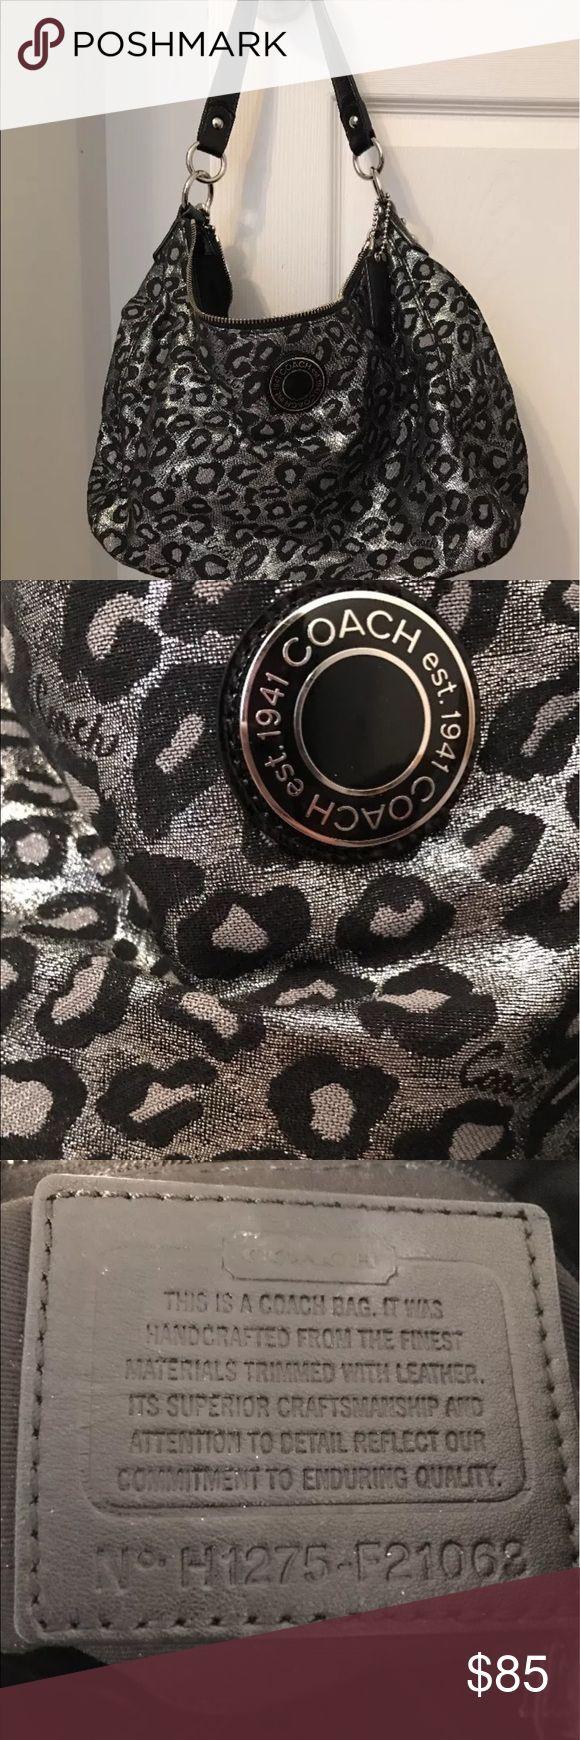 Coach Purse Coach black leopard print bag Coach Bags Shoulder Bags